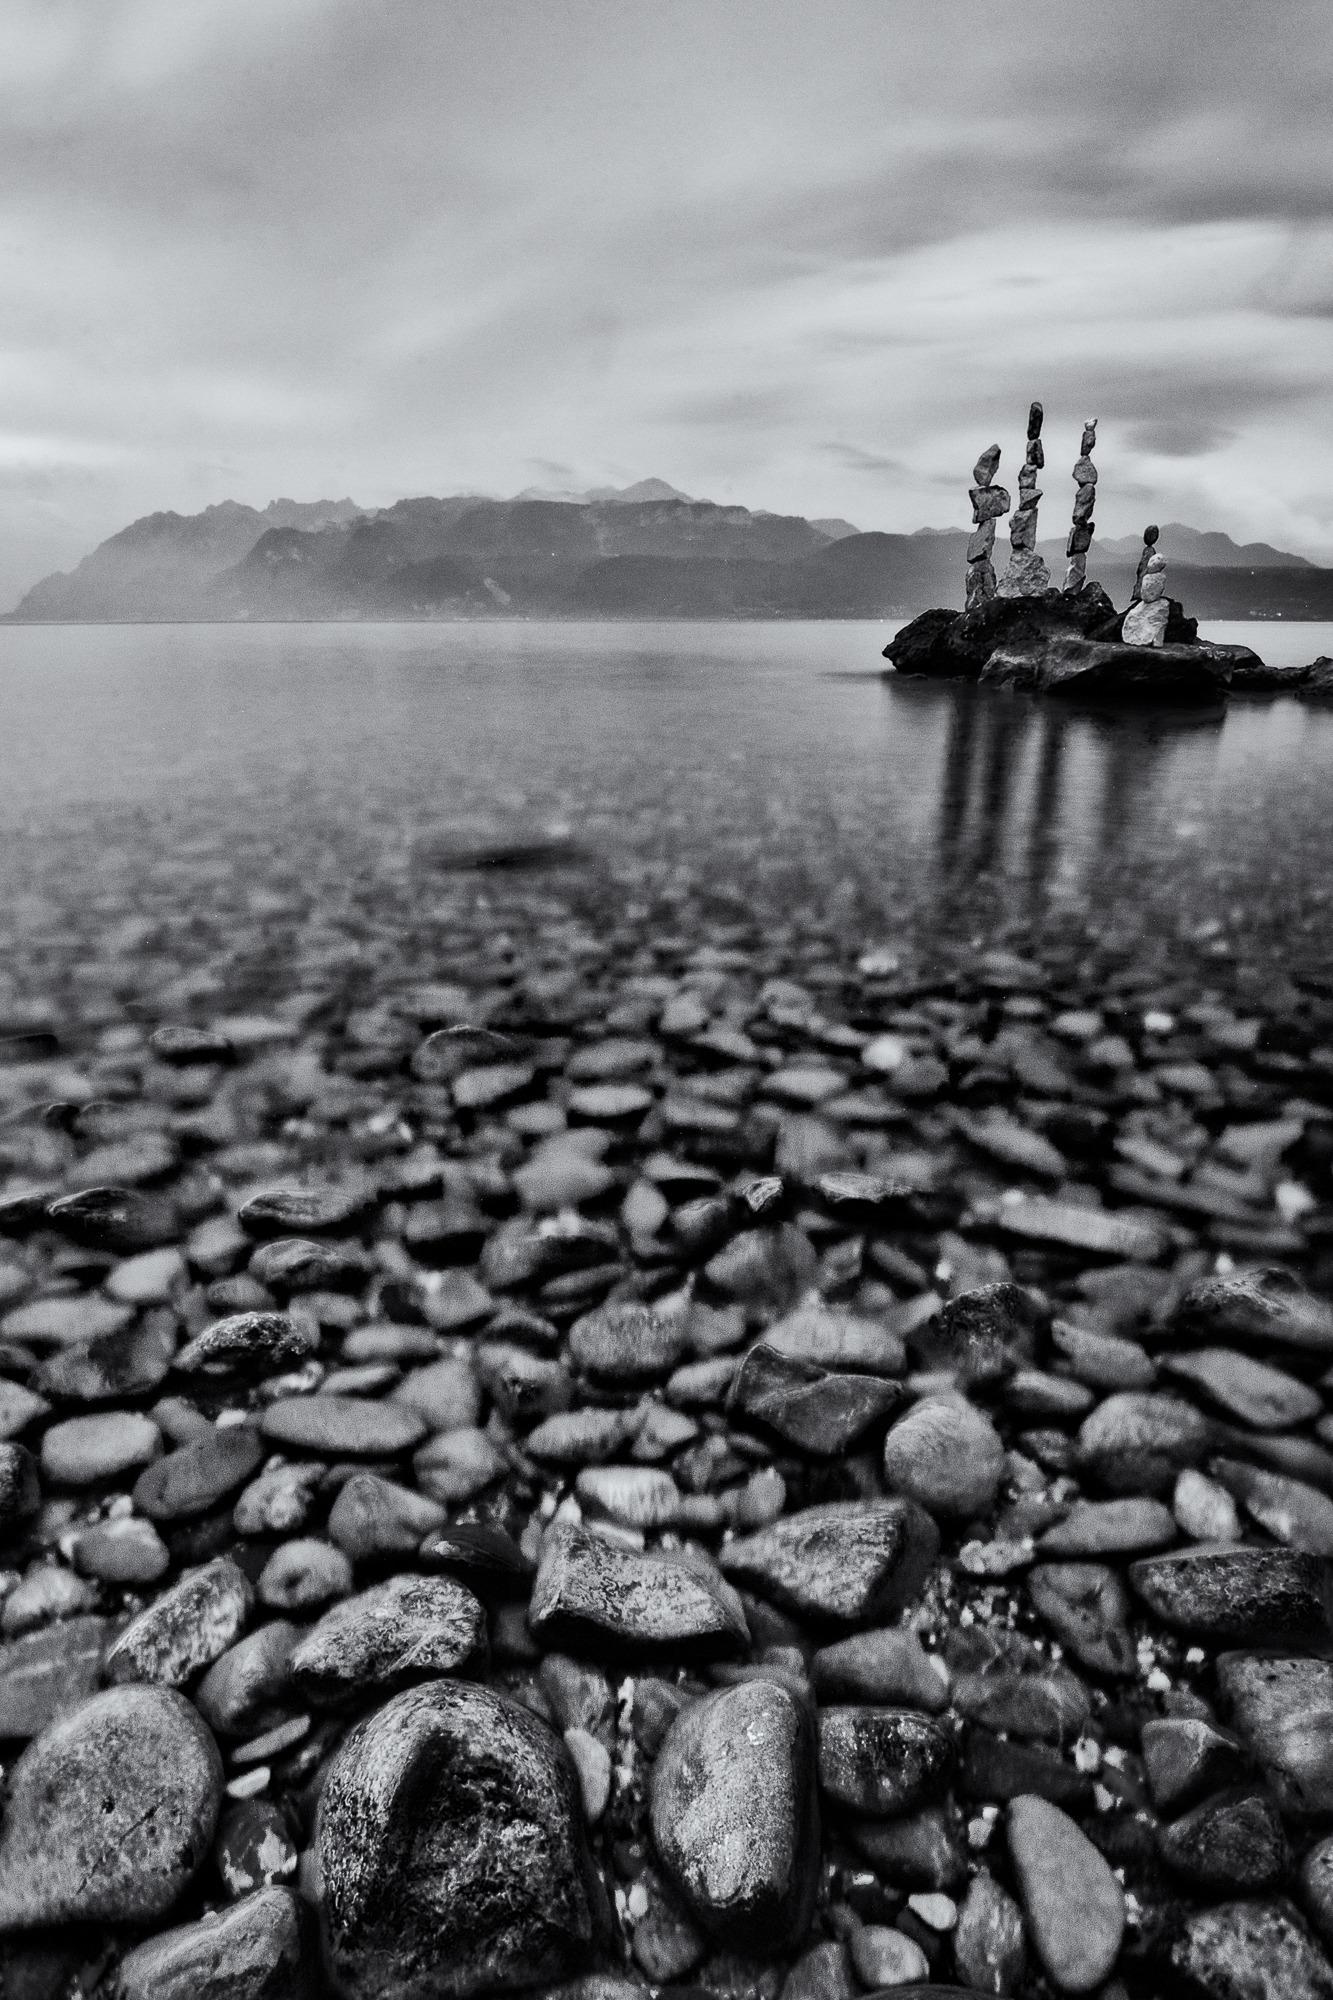 stones lake lausanne geneva